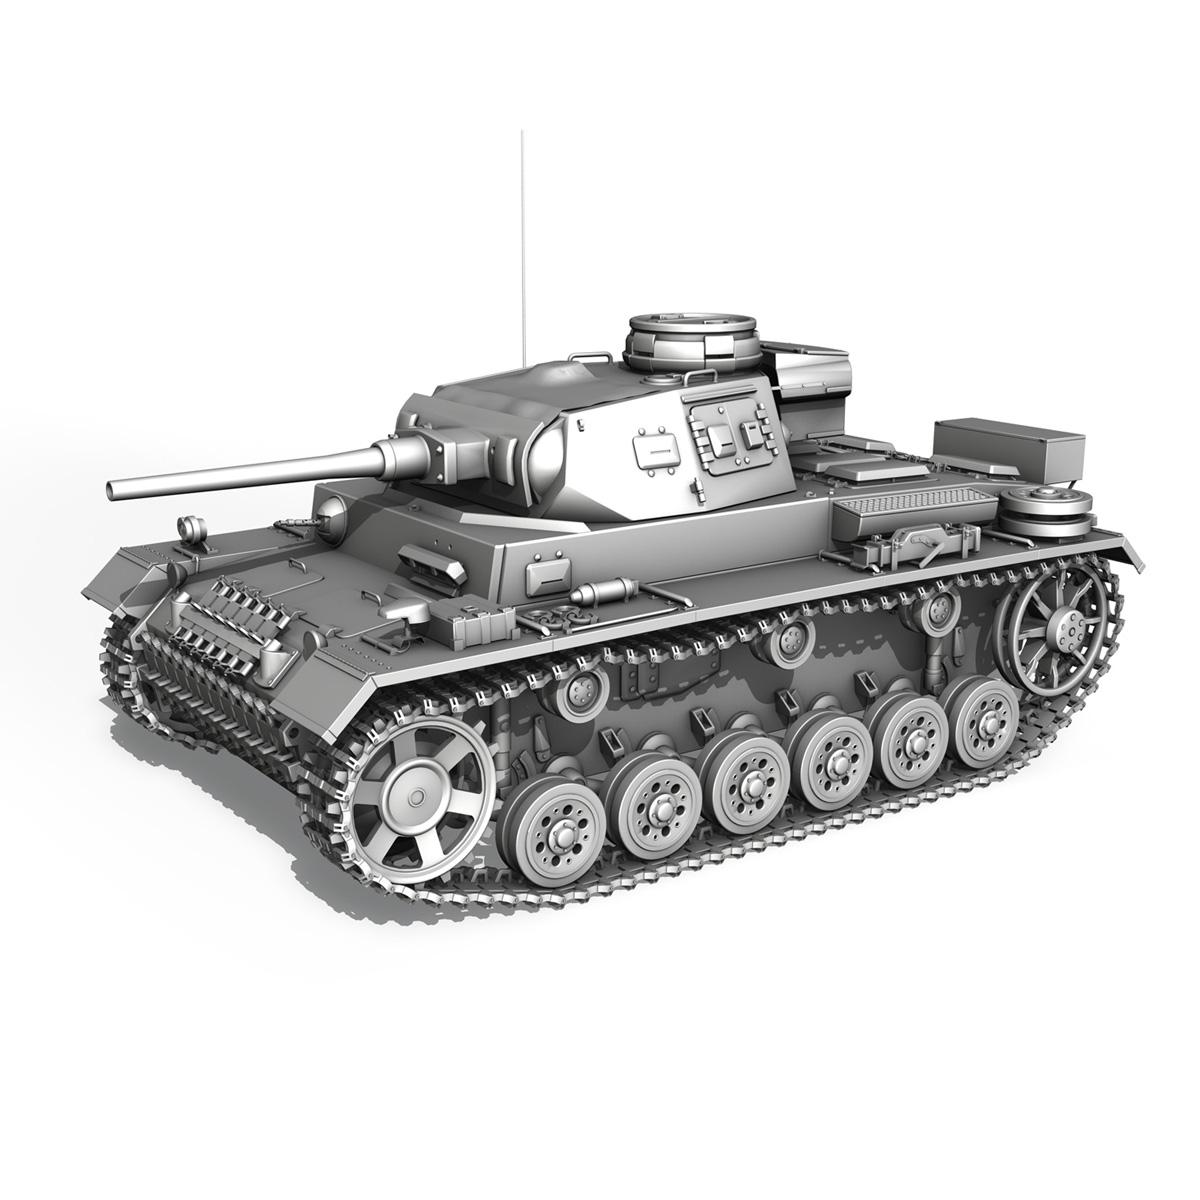 pzkpfw iii – panzer 3 – ausf.j – 624 3d model 3ds fbx lwo lw lws obj c4d 265308